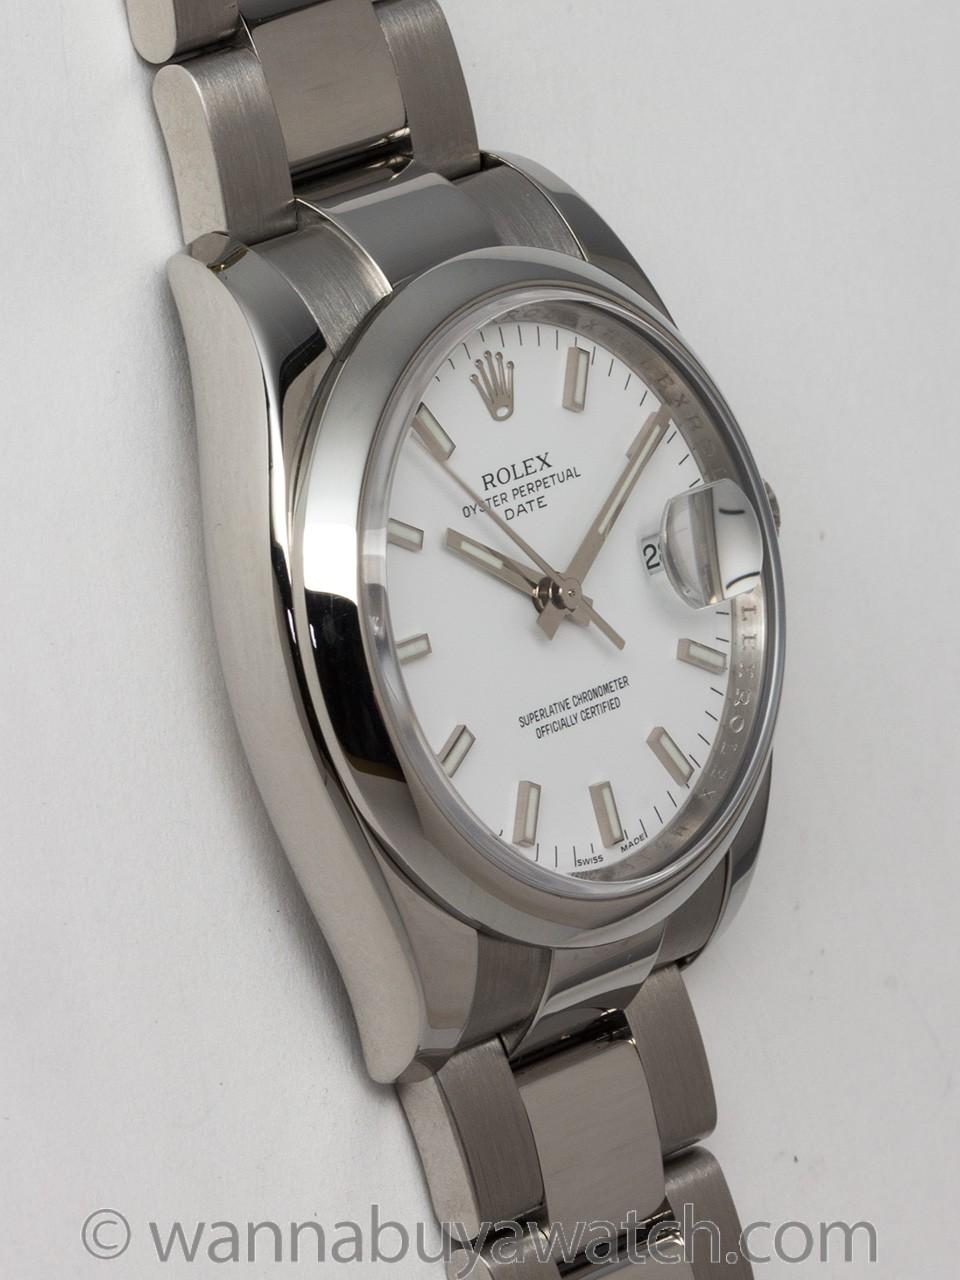 Rolex SS Oyster Perpetual Date ref 115200 circa 2007